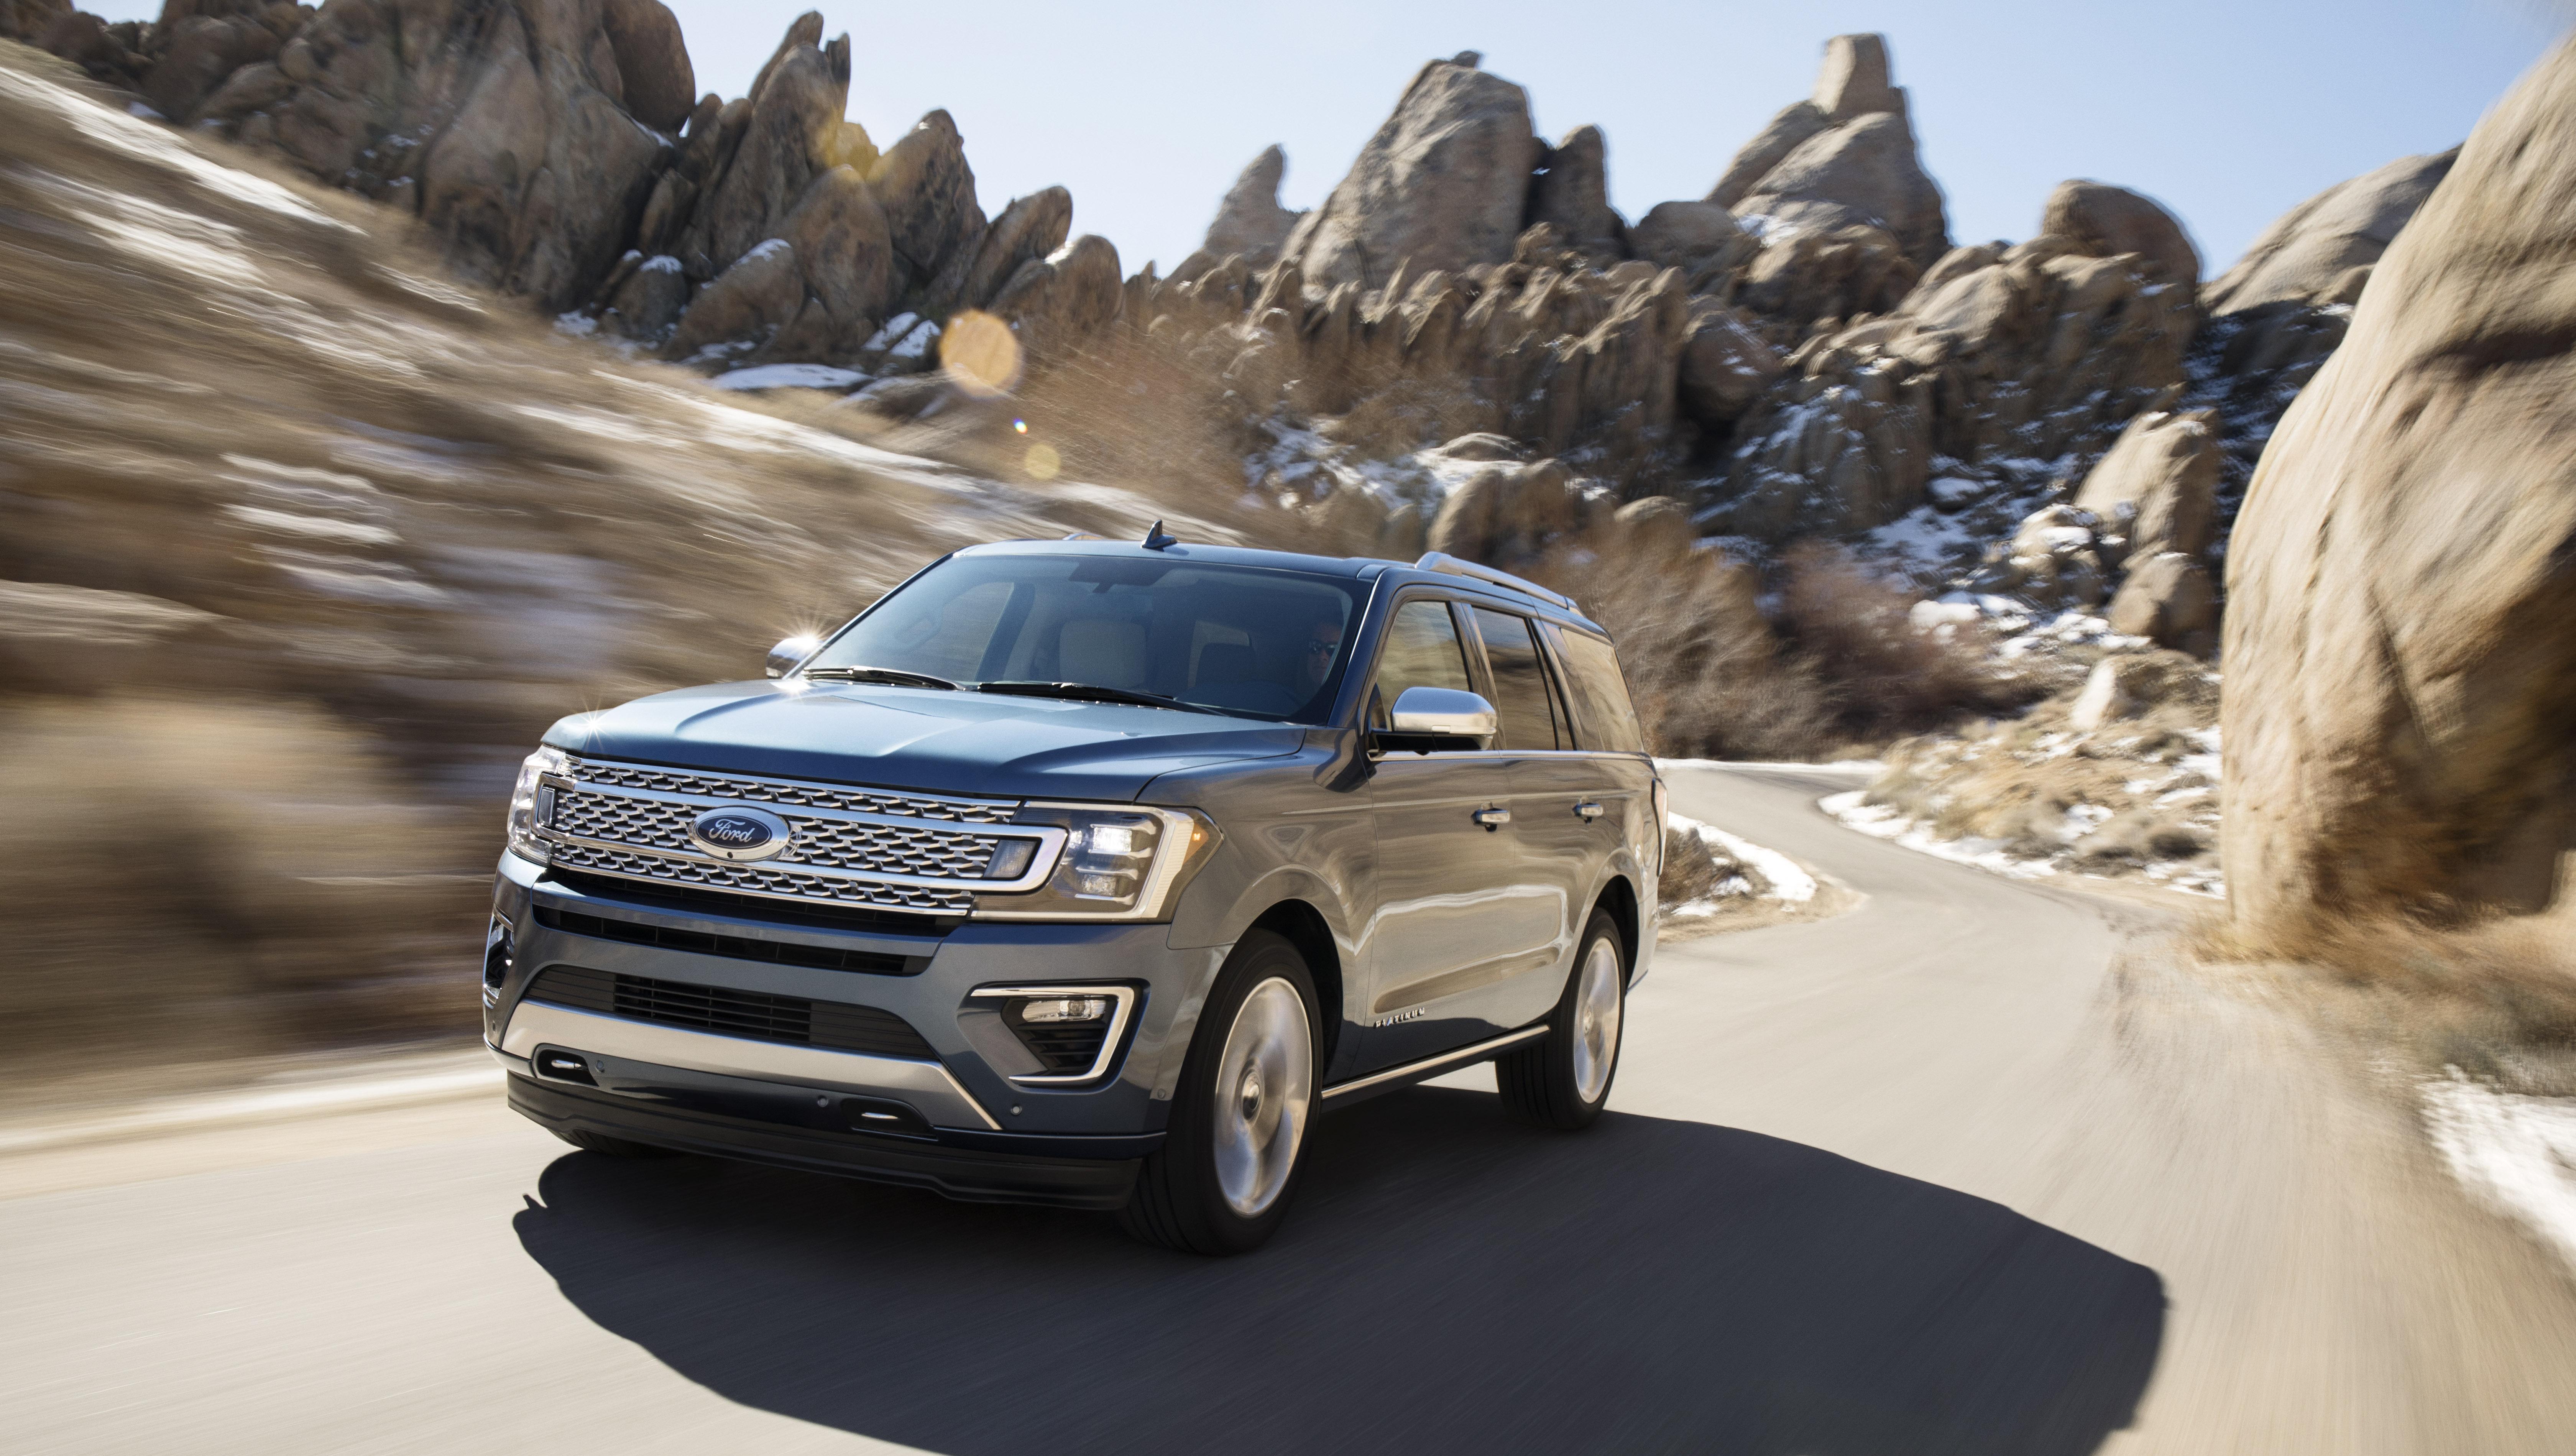 the year motor dream trend suv edge ford beautiful cars contender of suvs elegant